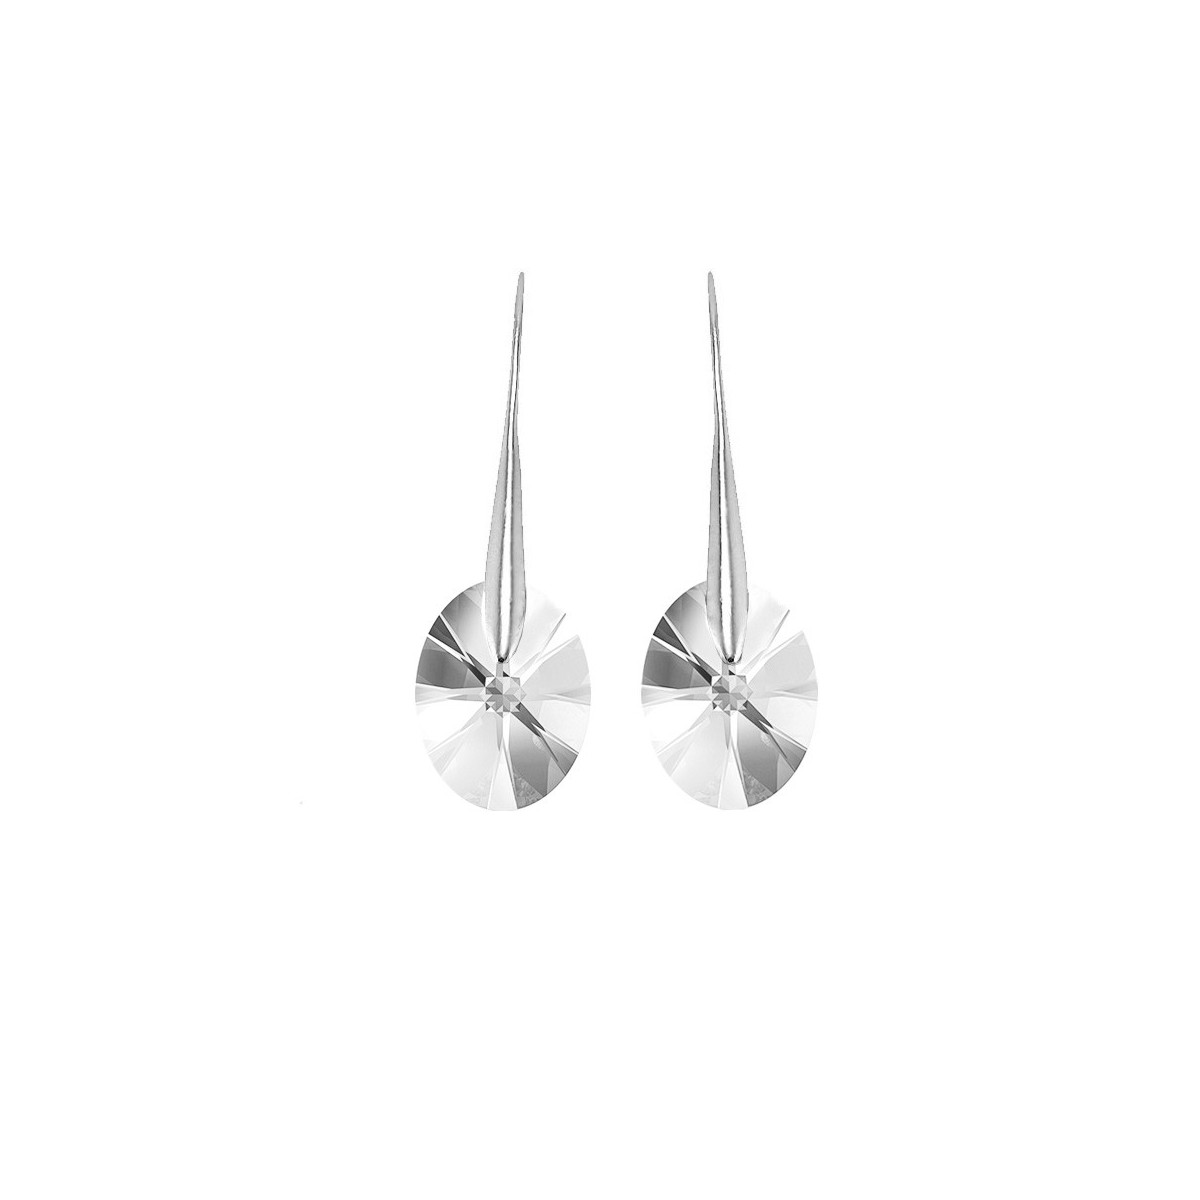 Boucles d'oreilles So Charm ornées d'un cristal ovale blanc made with crystal from Swarovski